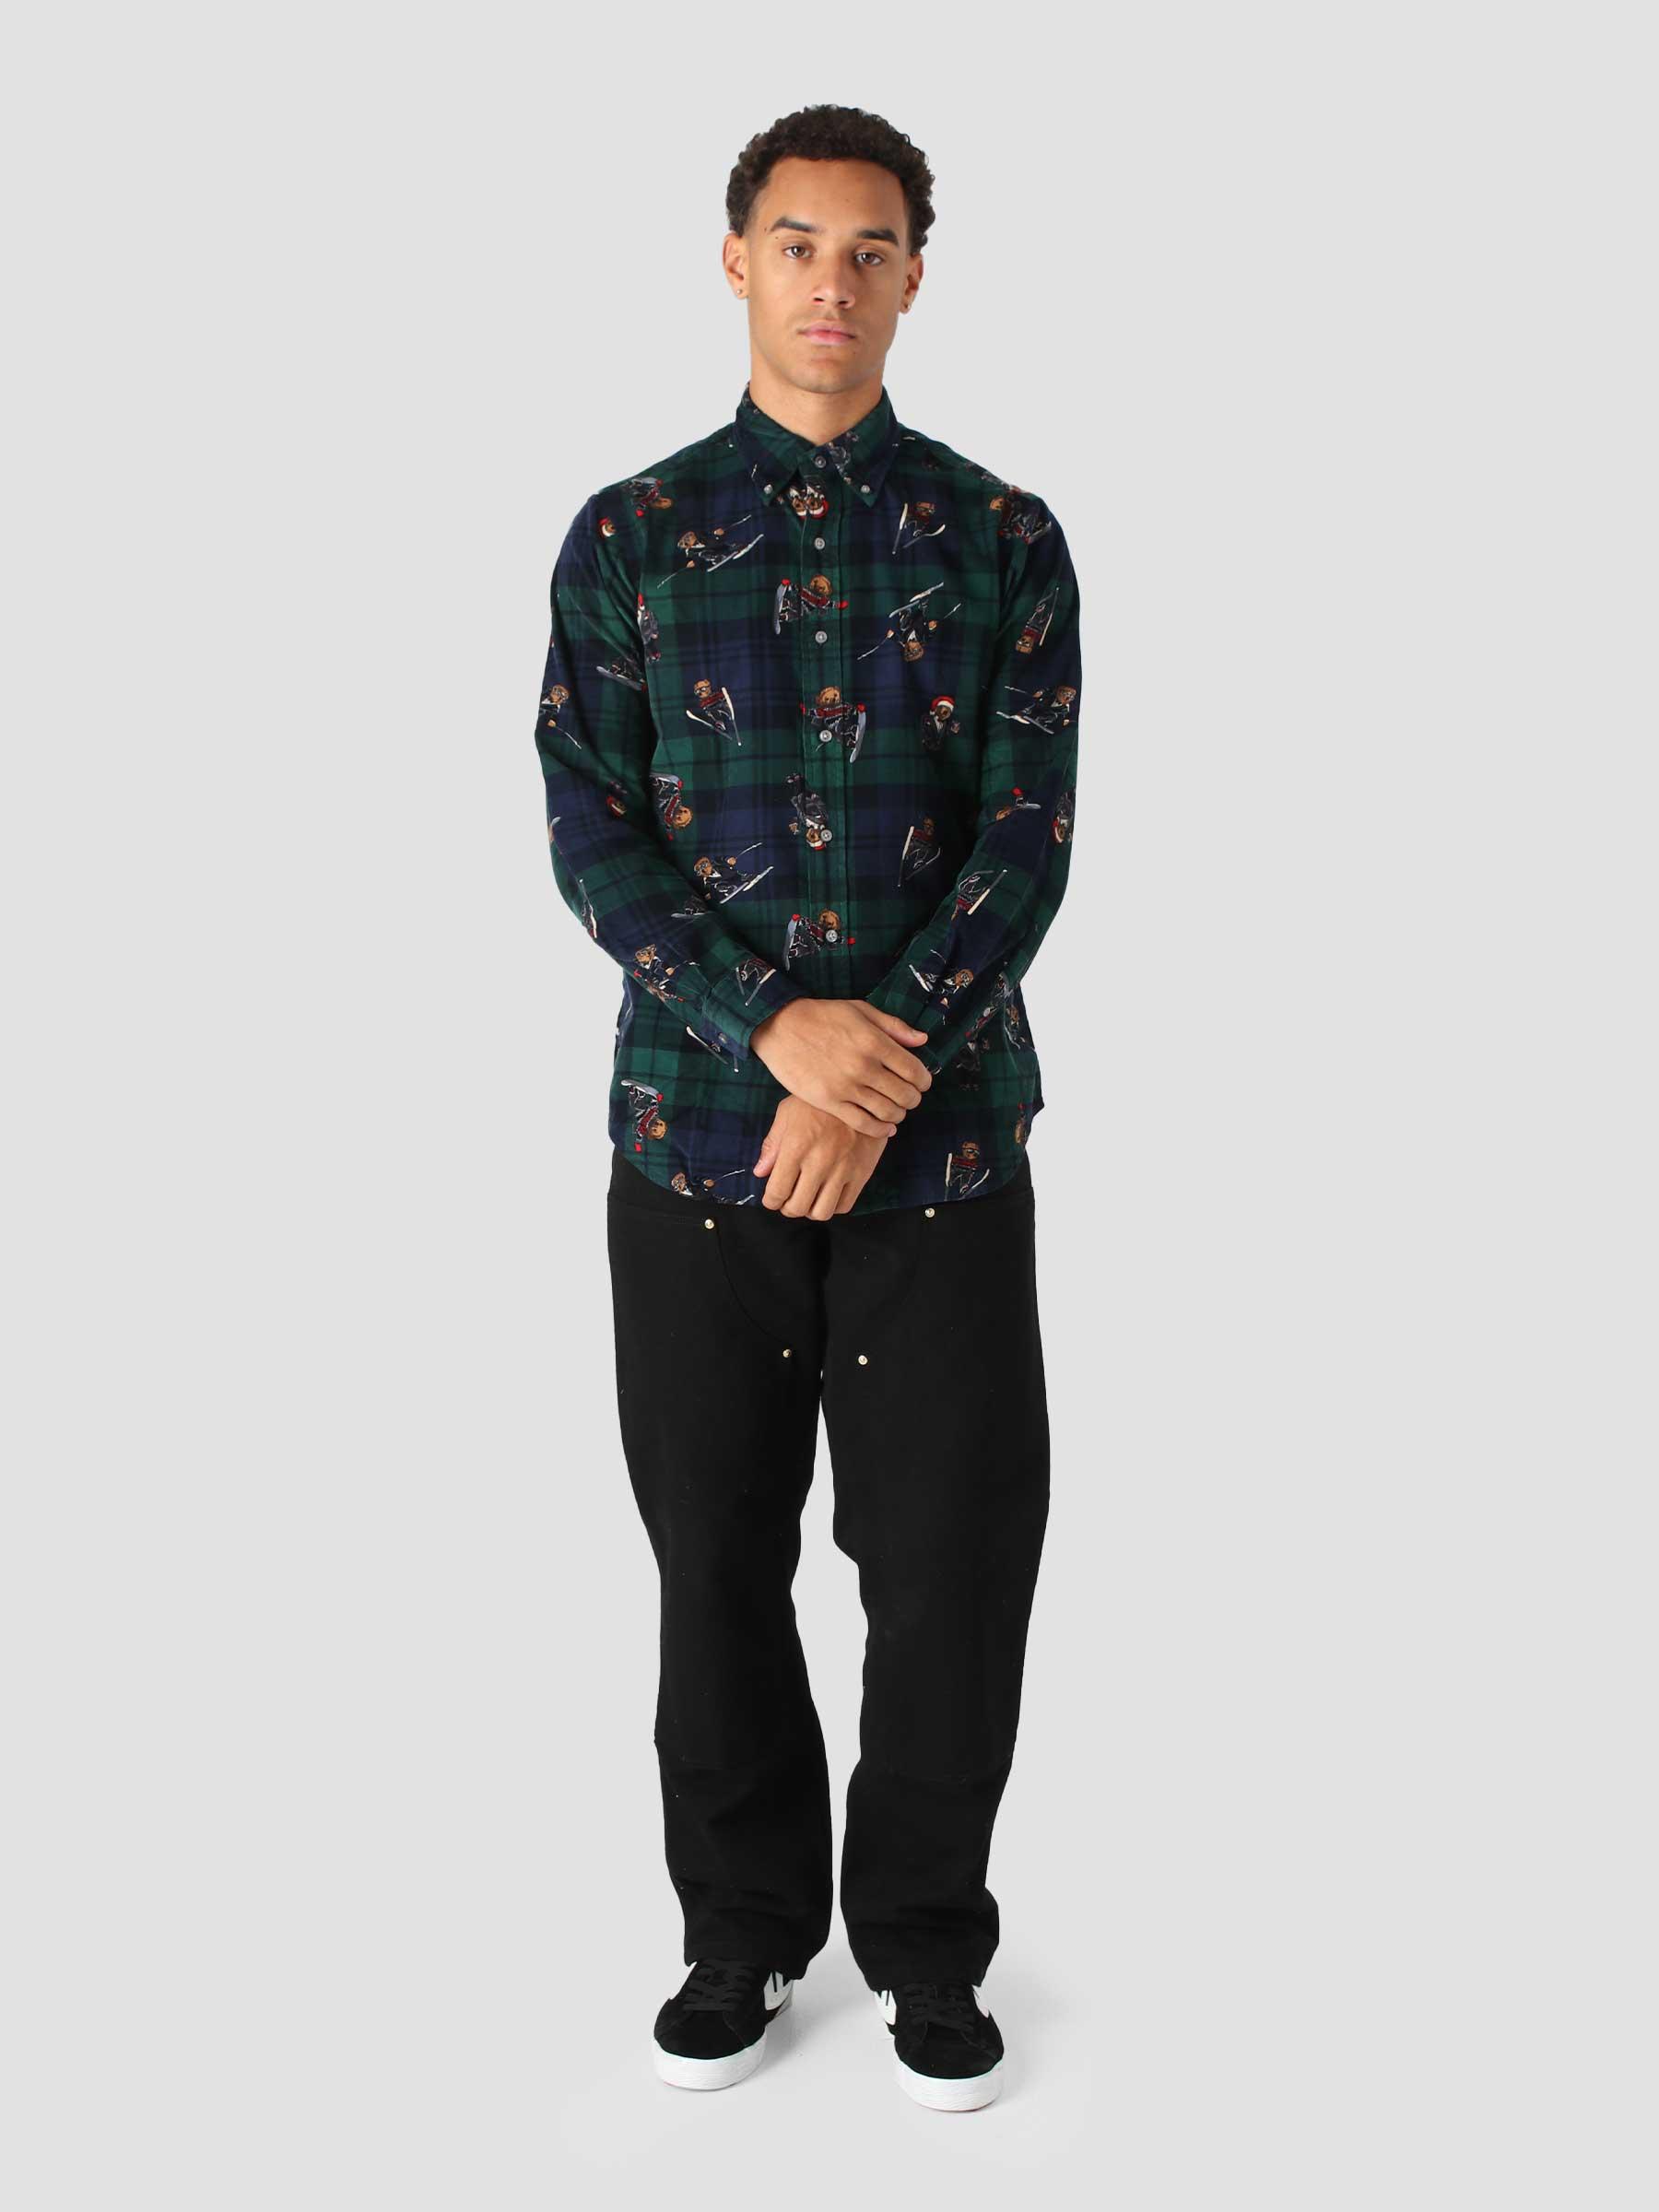 80-2 21W Corduroy Shirt 4213 Blackwatch Bears 710851340001